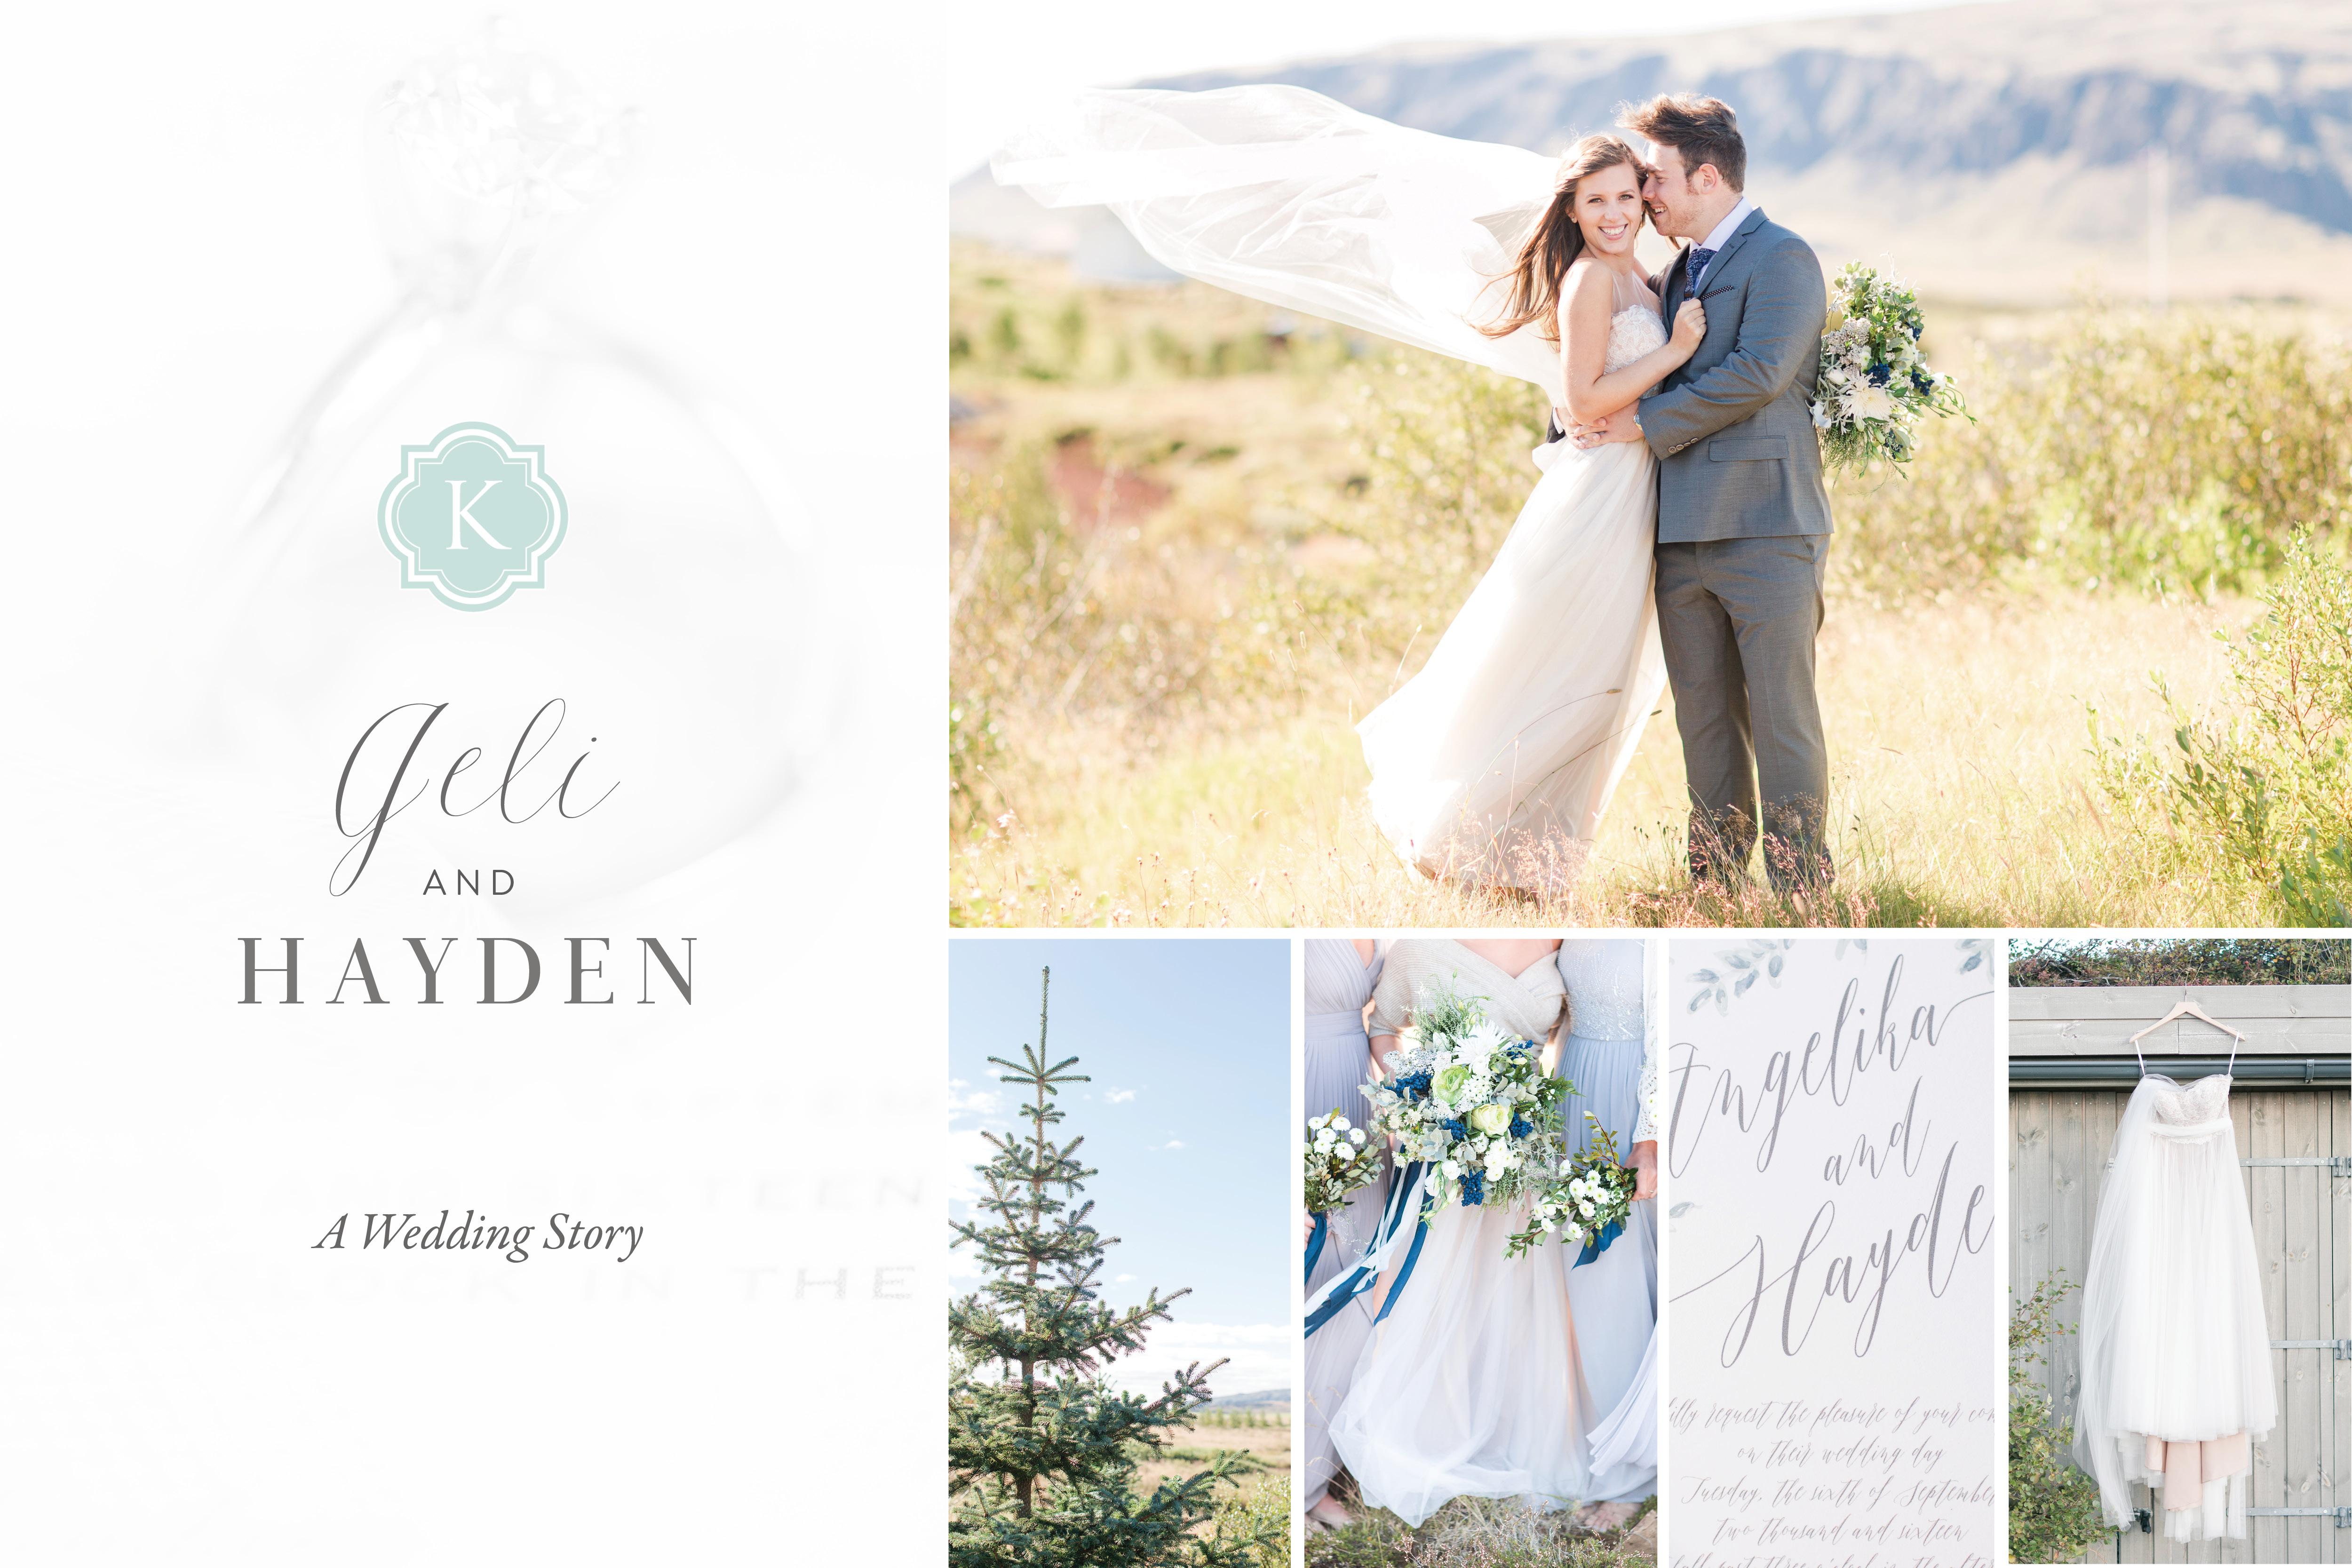 an-intimate-destination-wedding-iceland